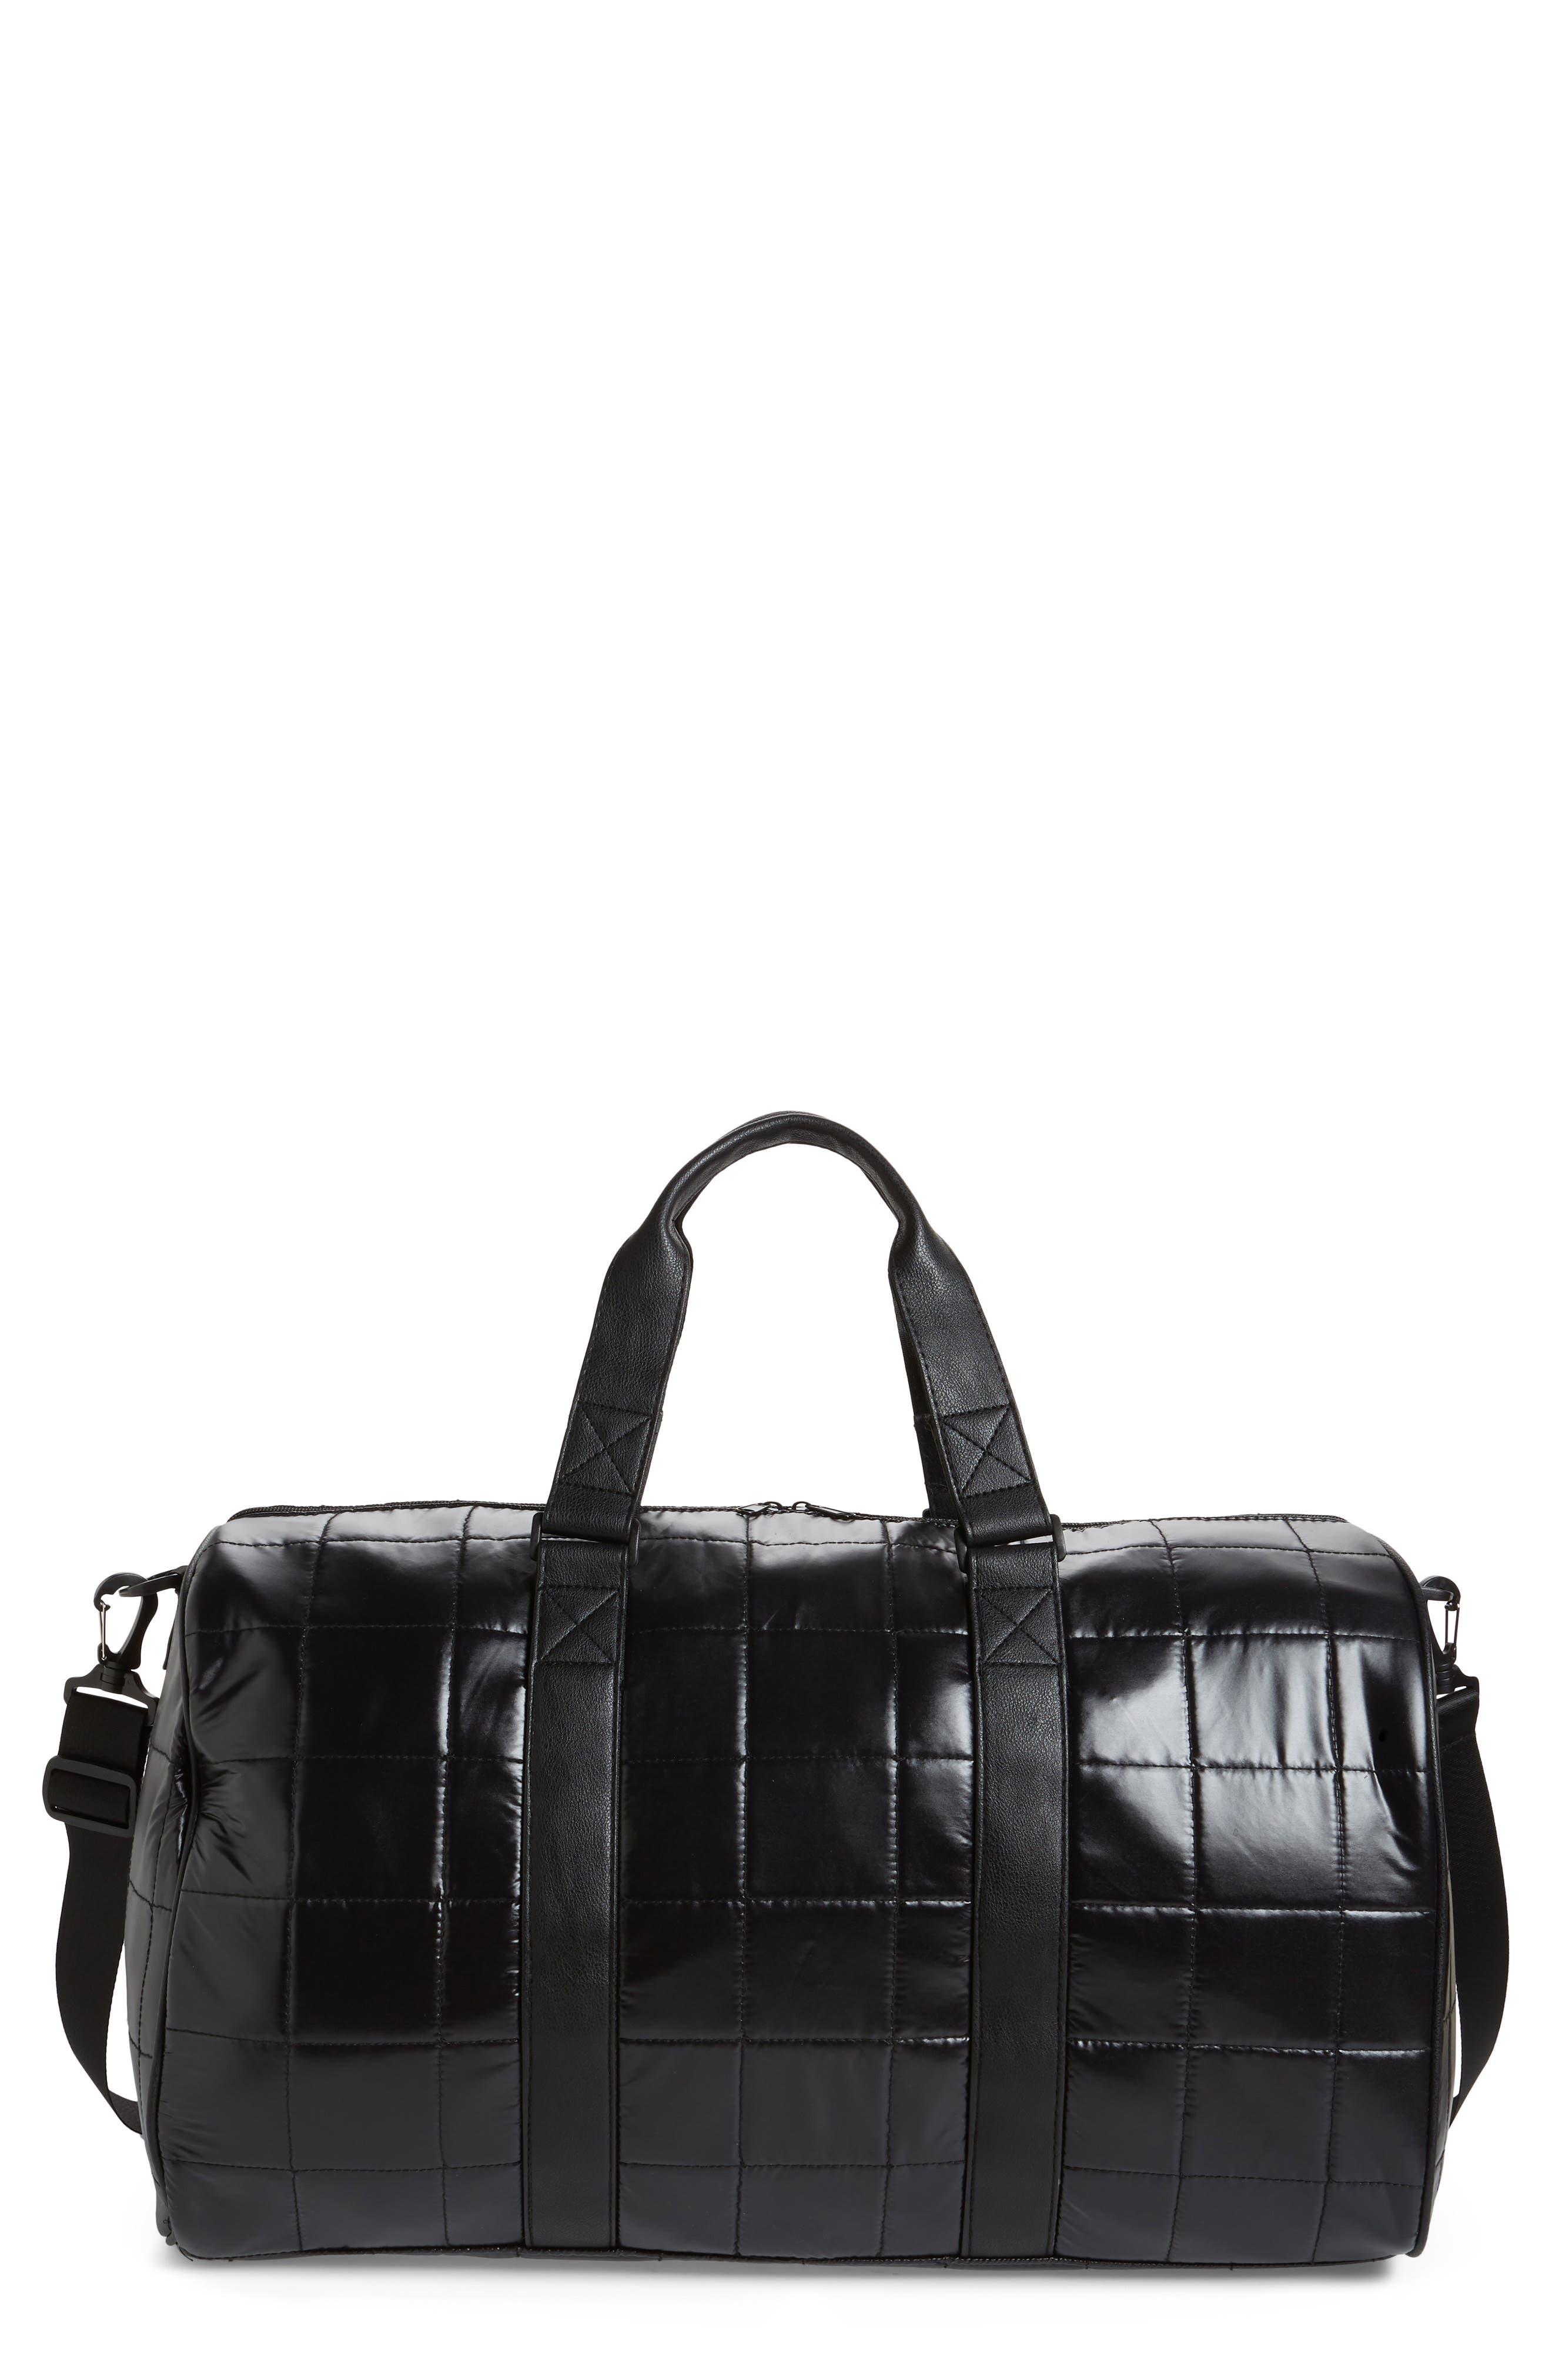 Puffer Duffel Bag,                             Main thumbnail 1, color,                             Black